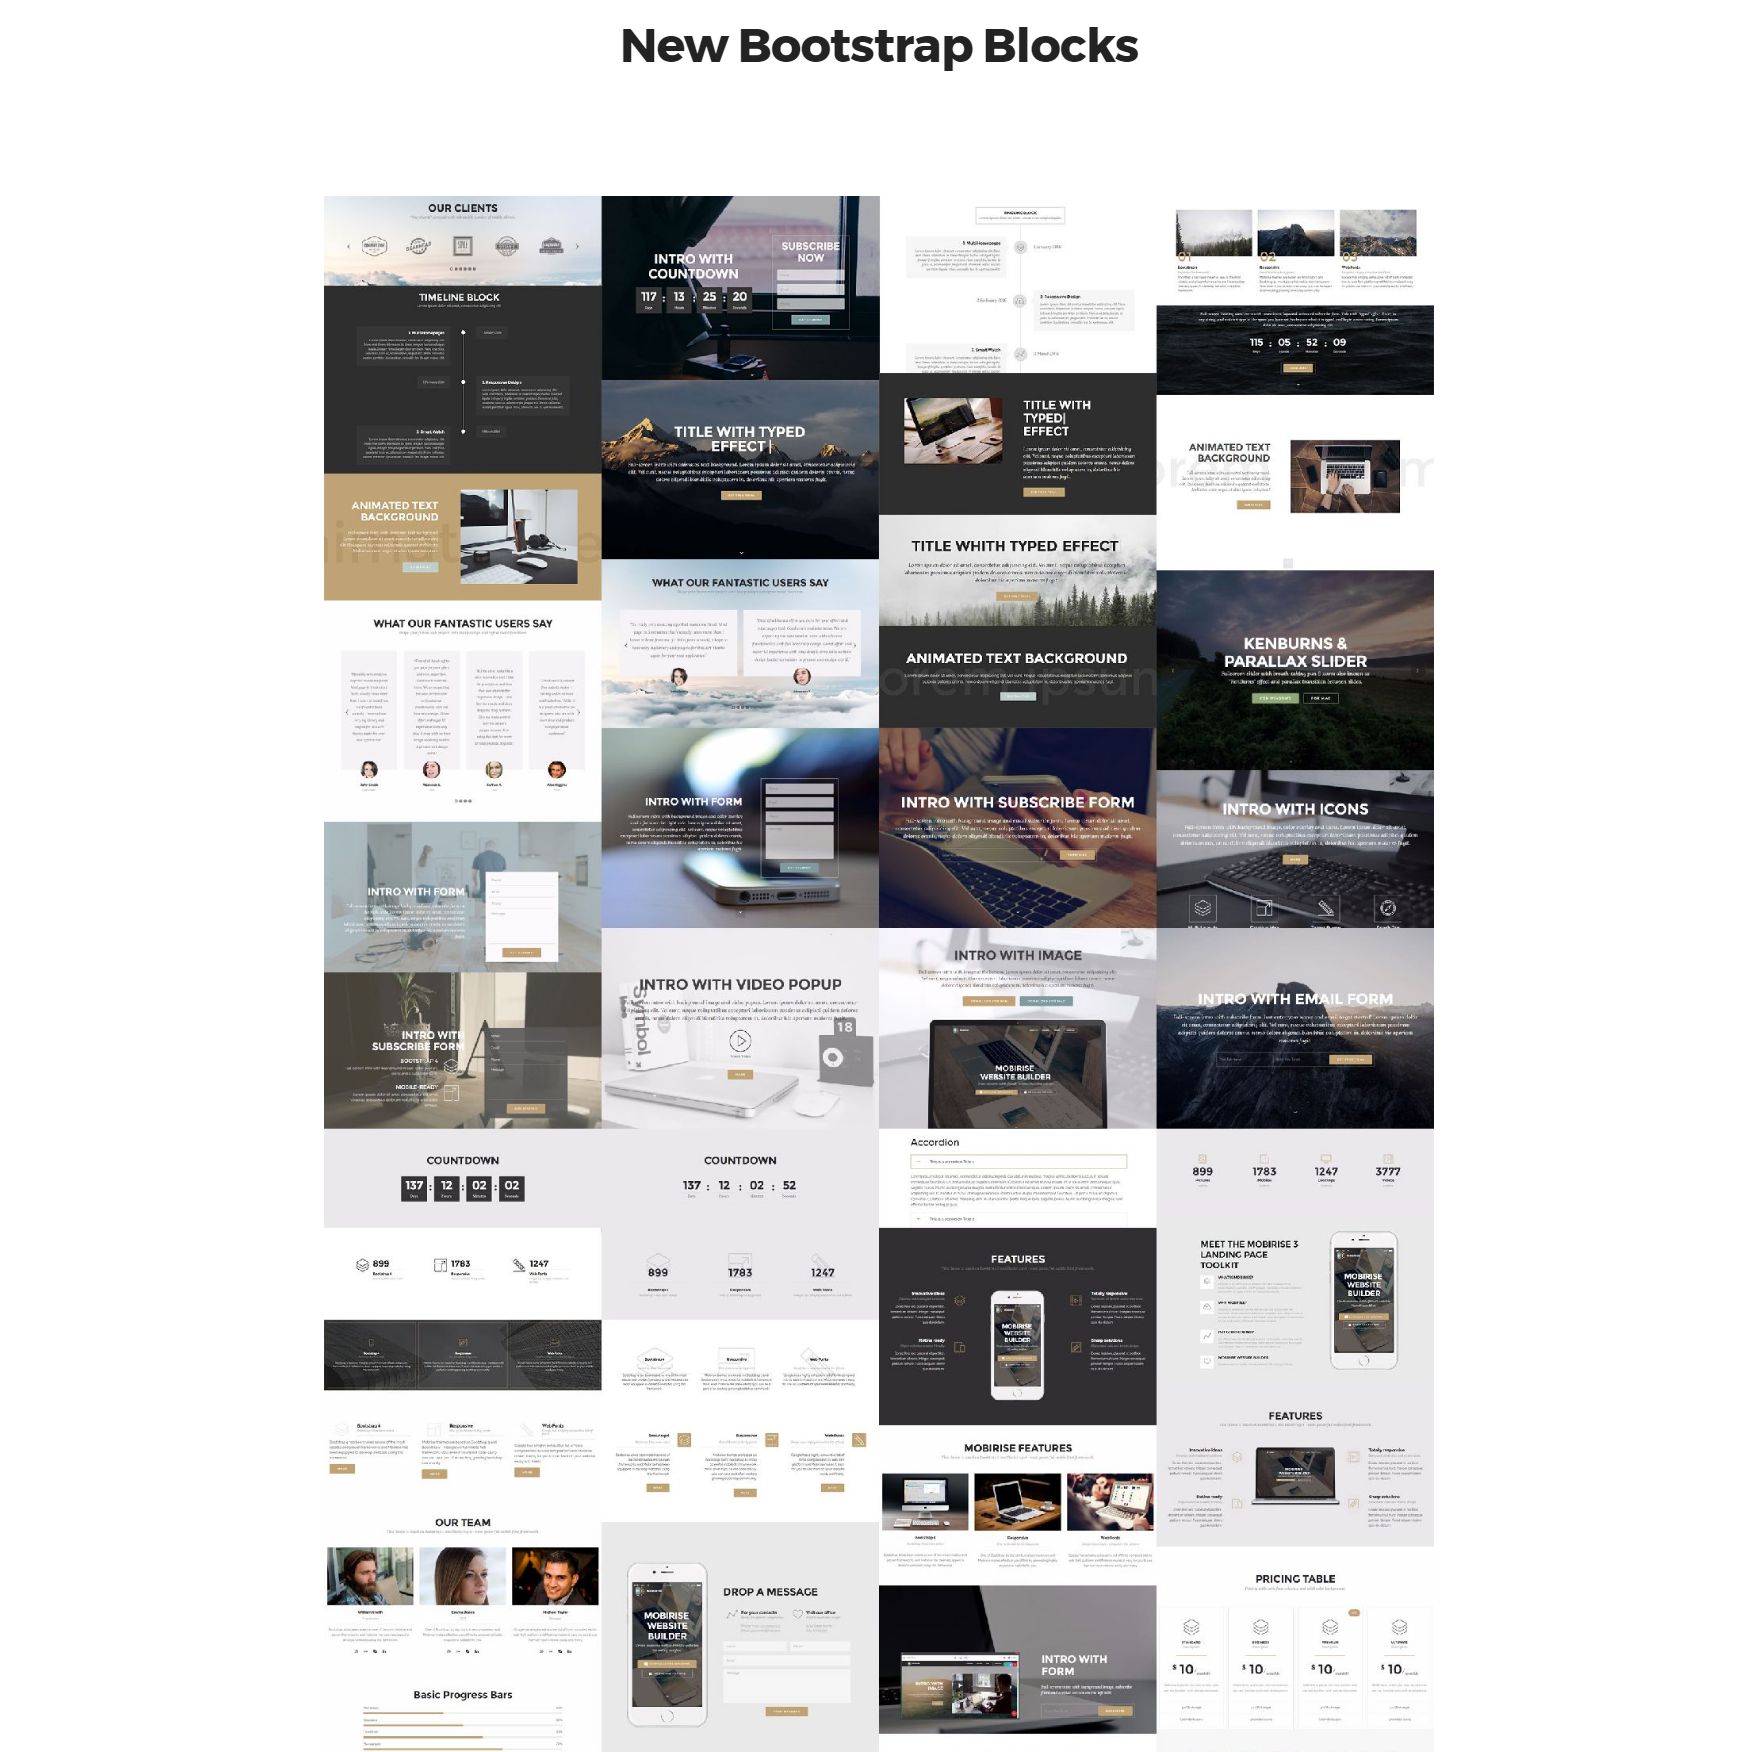 New Bootstrap Blocks